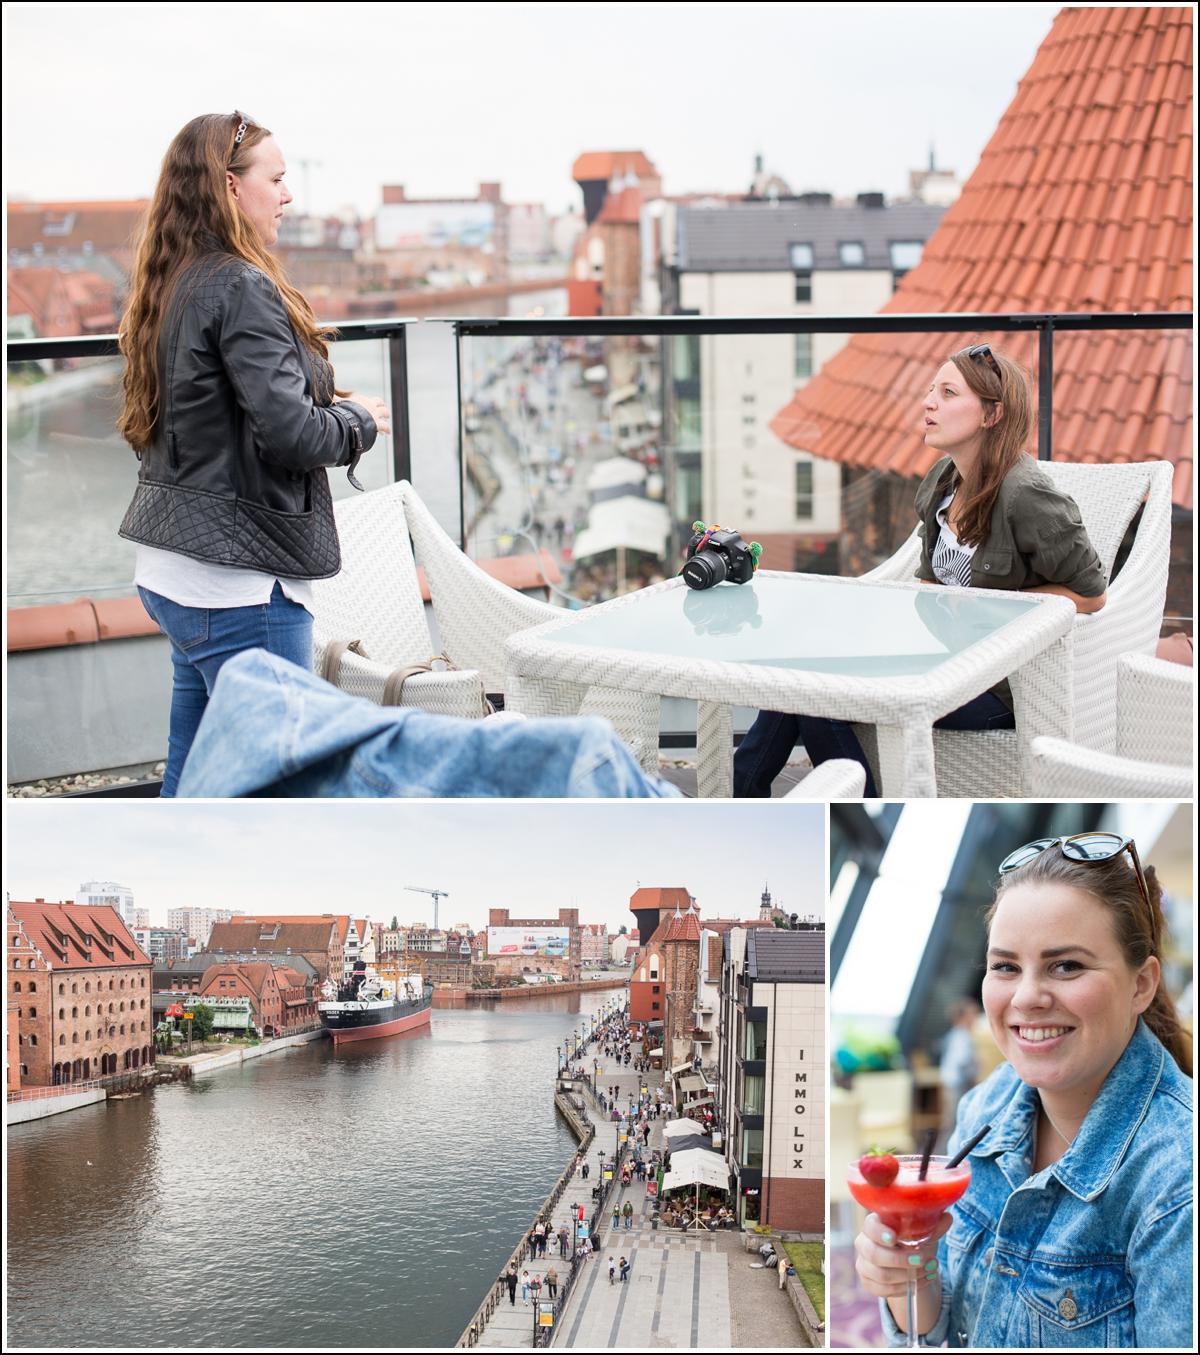 gdansk-hilton-rooftop